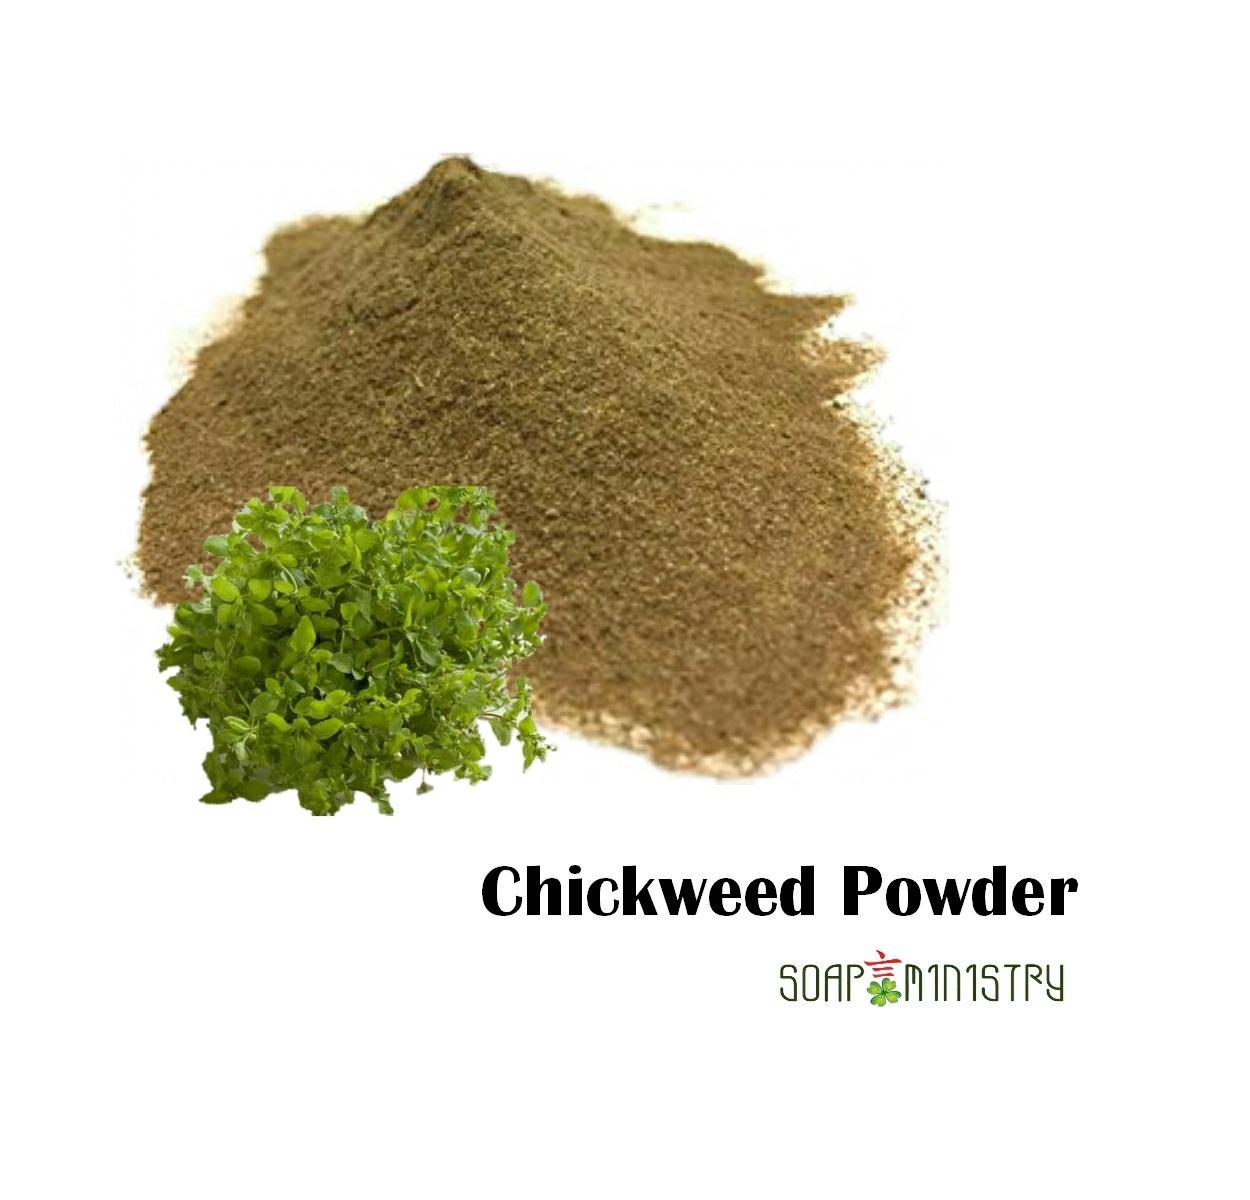 ChickWeed Powder 500g